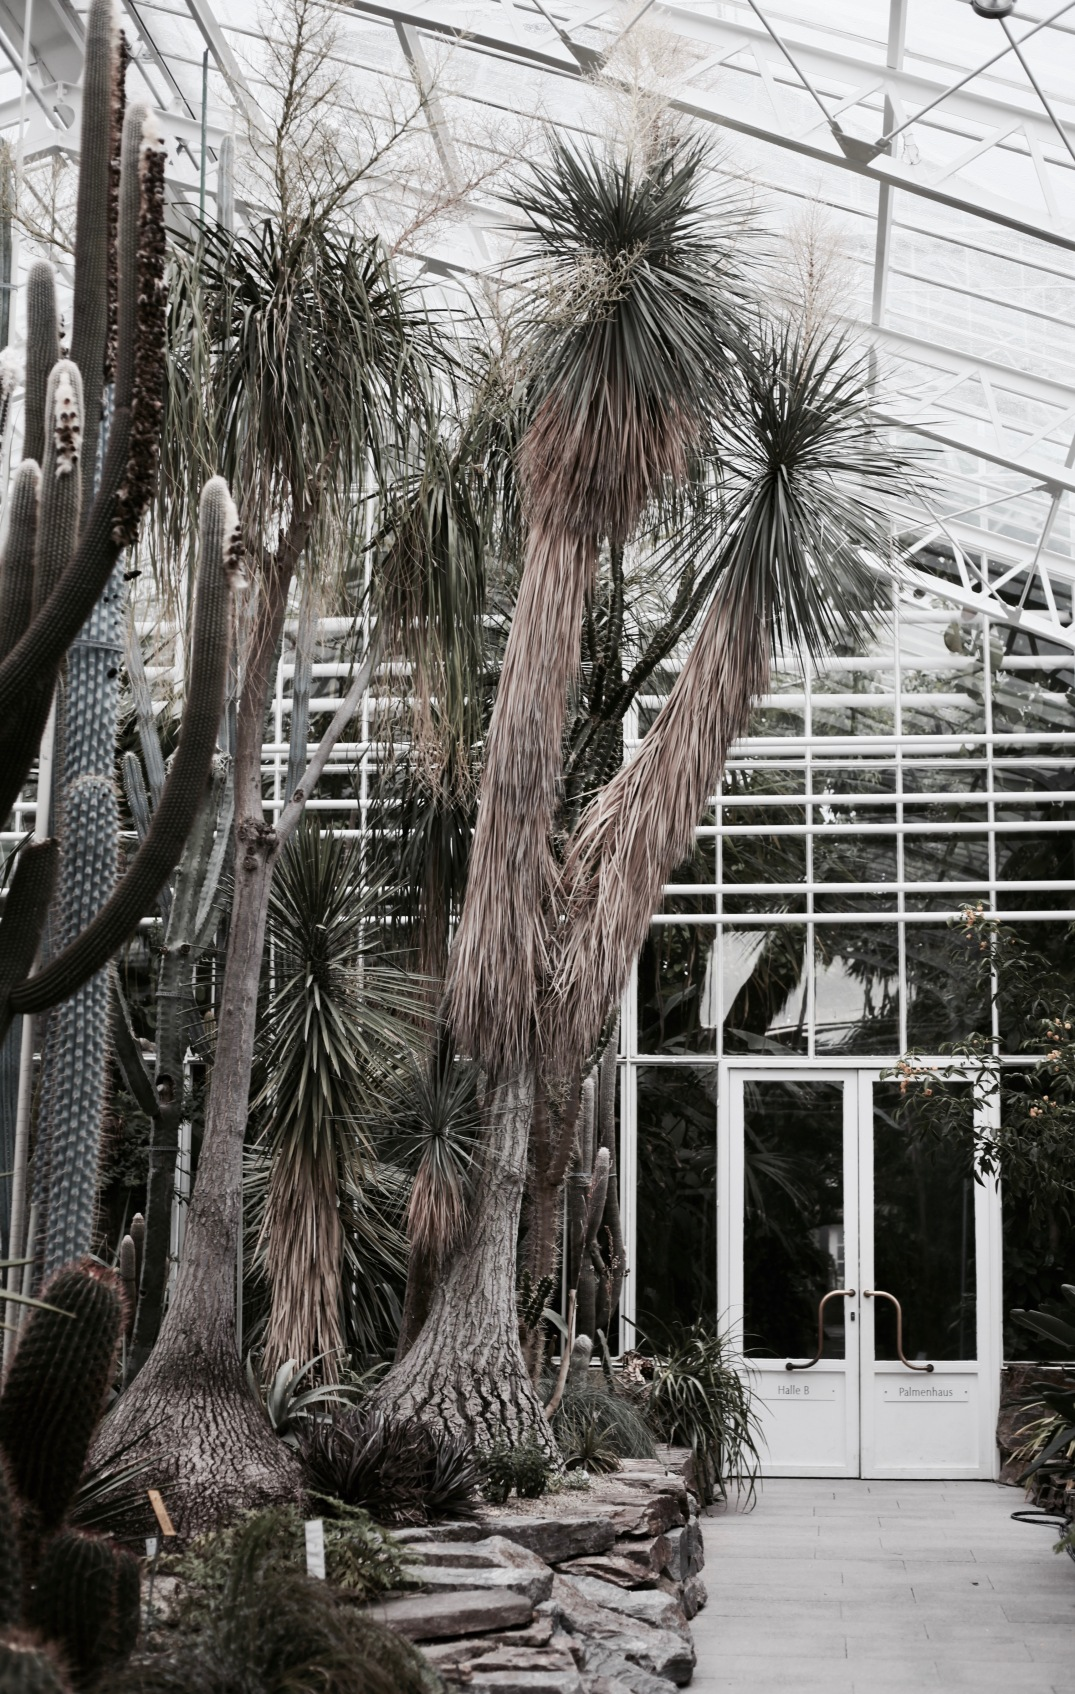 detail at botanical garden in Munich, Germany